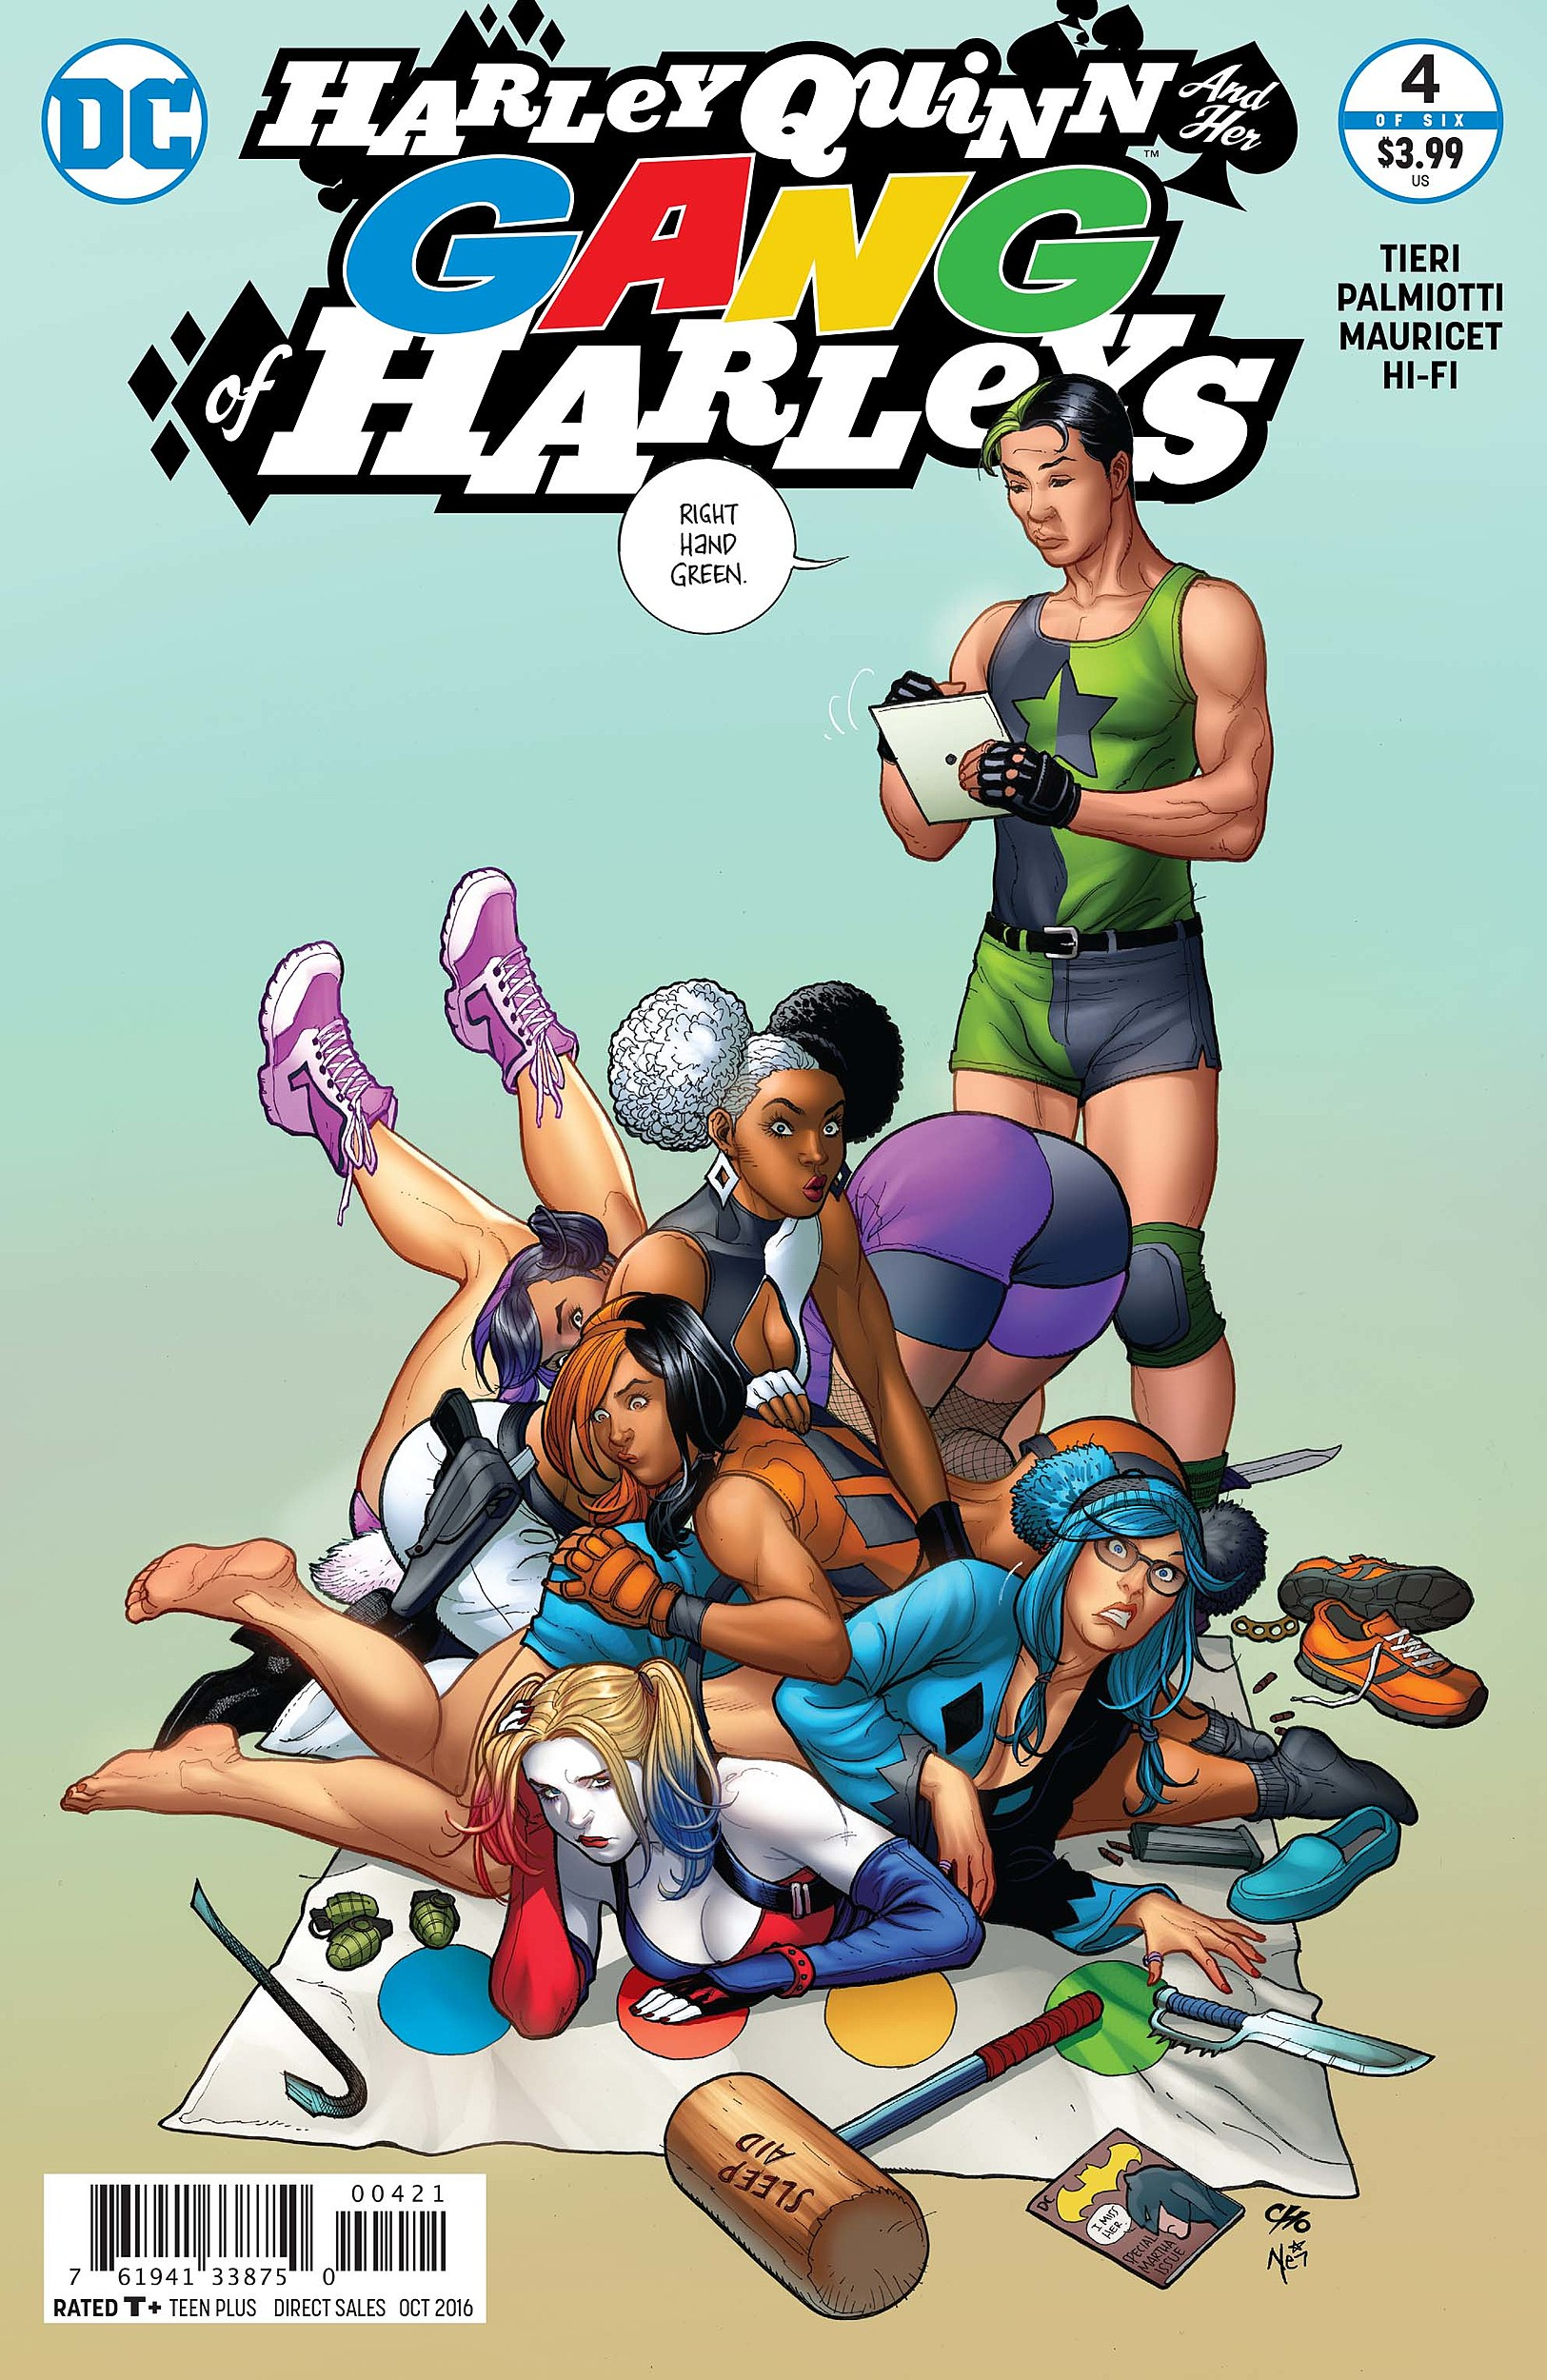 DC COMICS HARLEY QUINN AND HER GANG OF HARLEYS #4 2016 AMANDA CONNER COVER